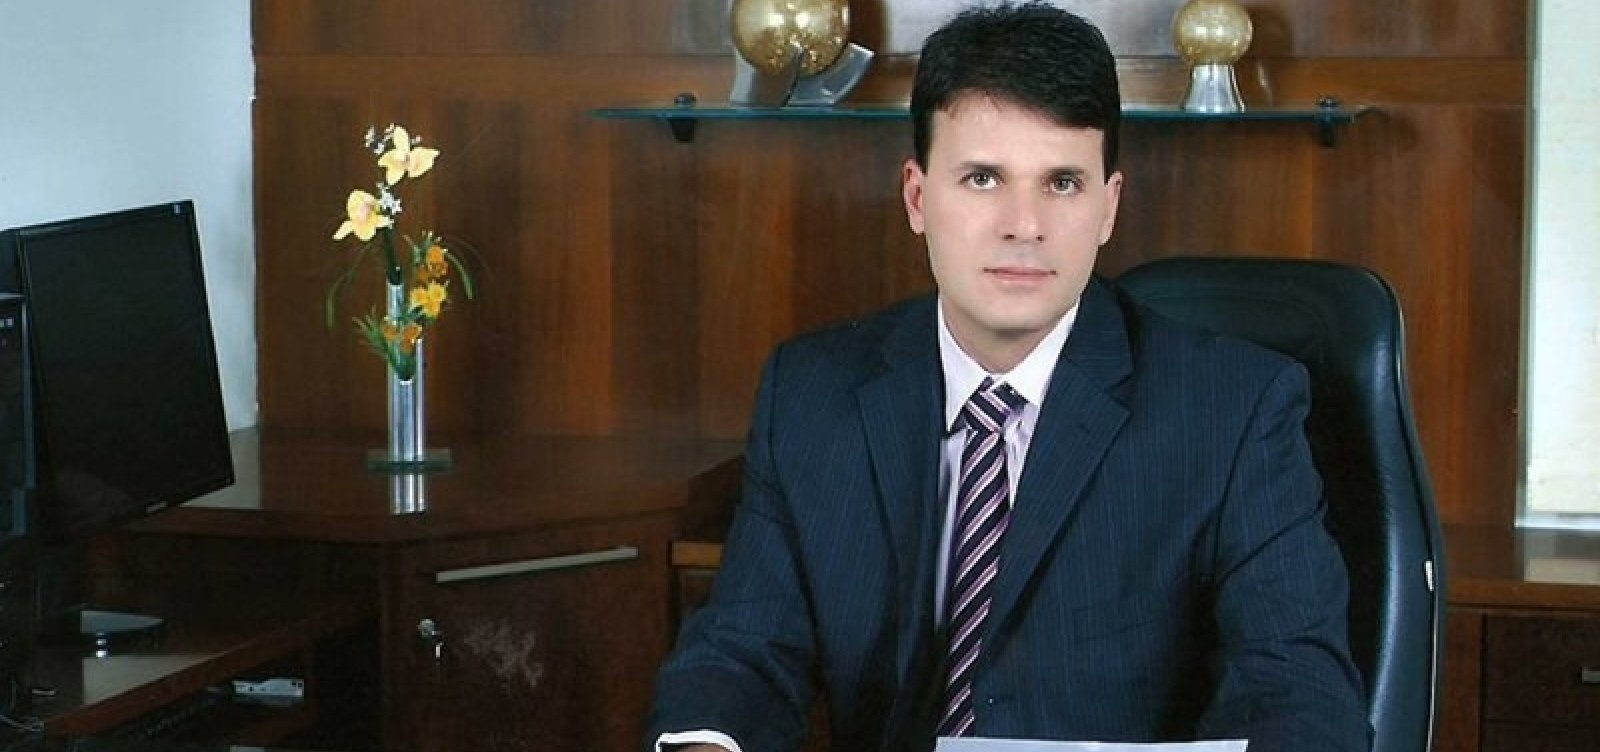 [Itaberaba: ex-prefeito é condenado a pagar R$ 50 mil por demissões]